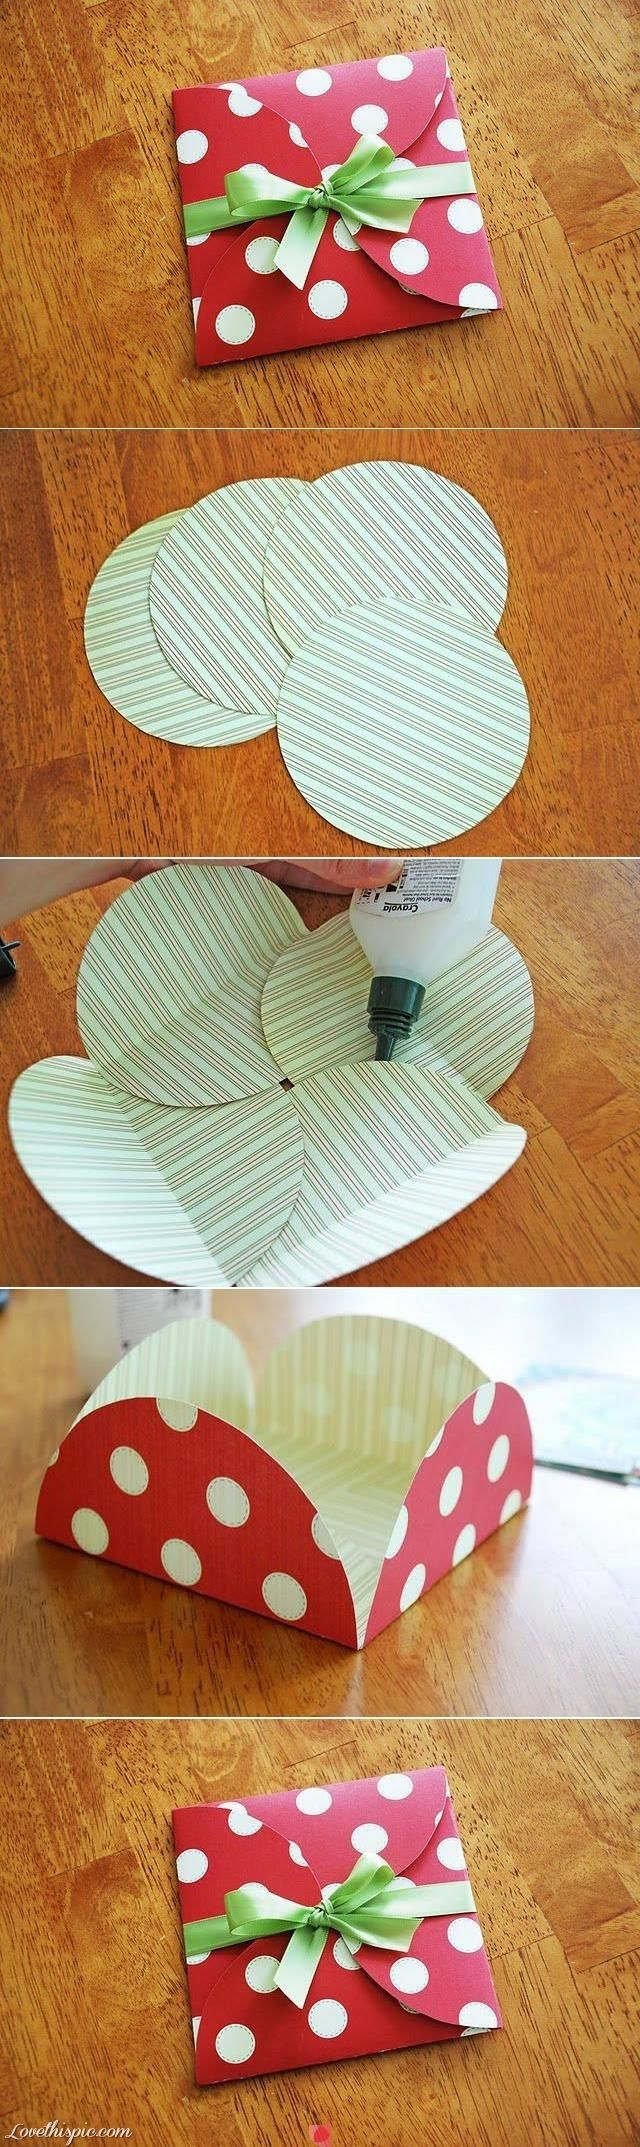 DIY gift case